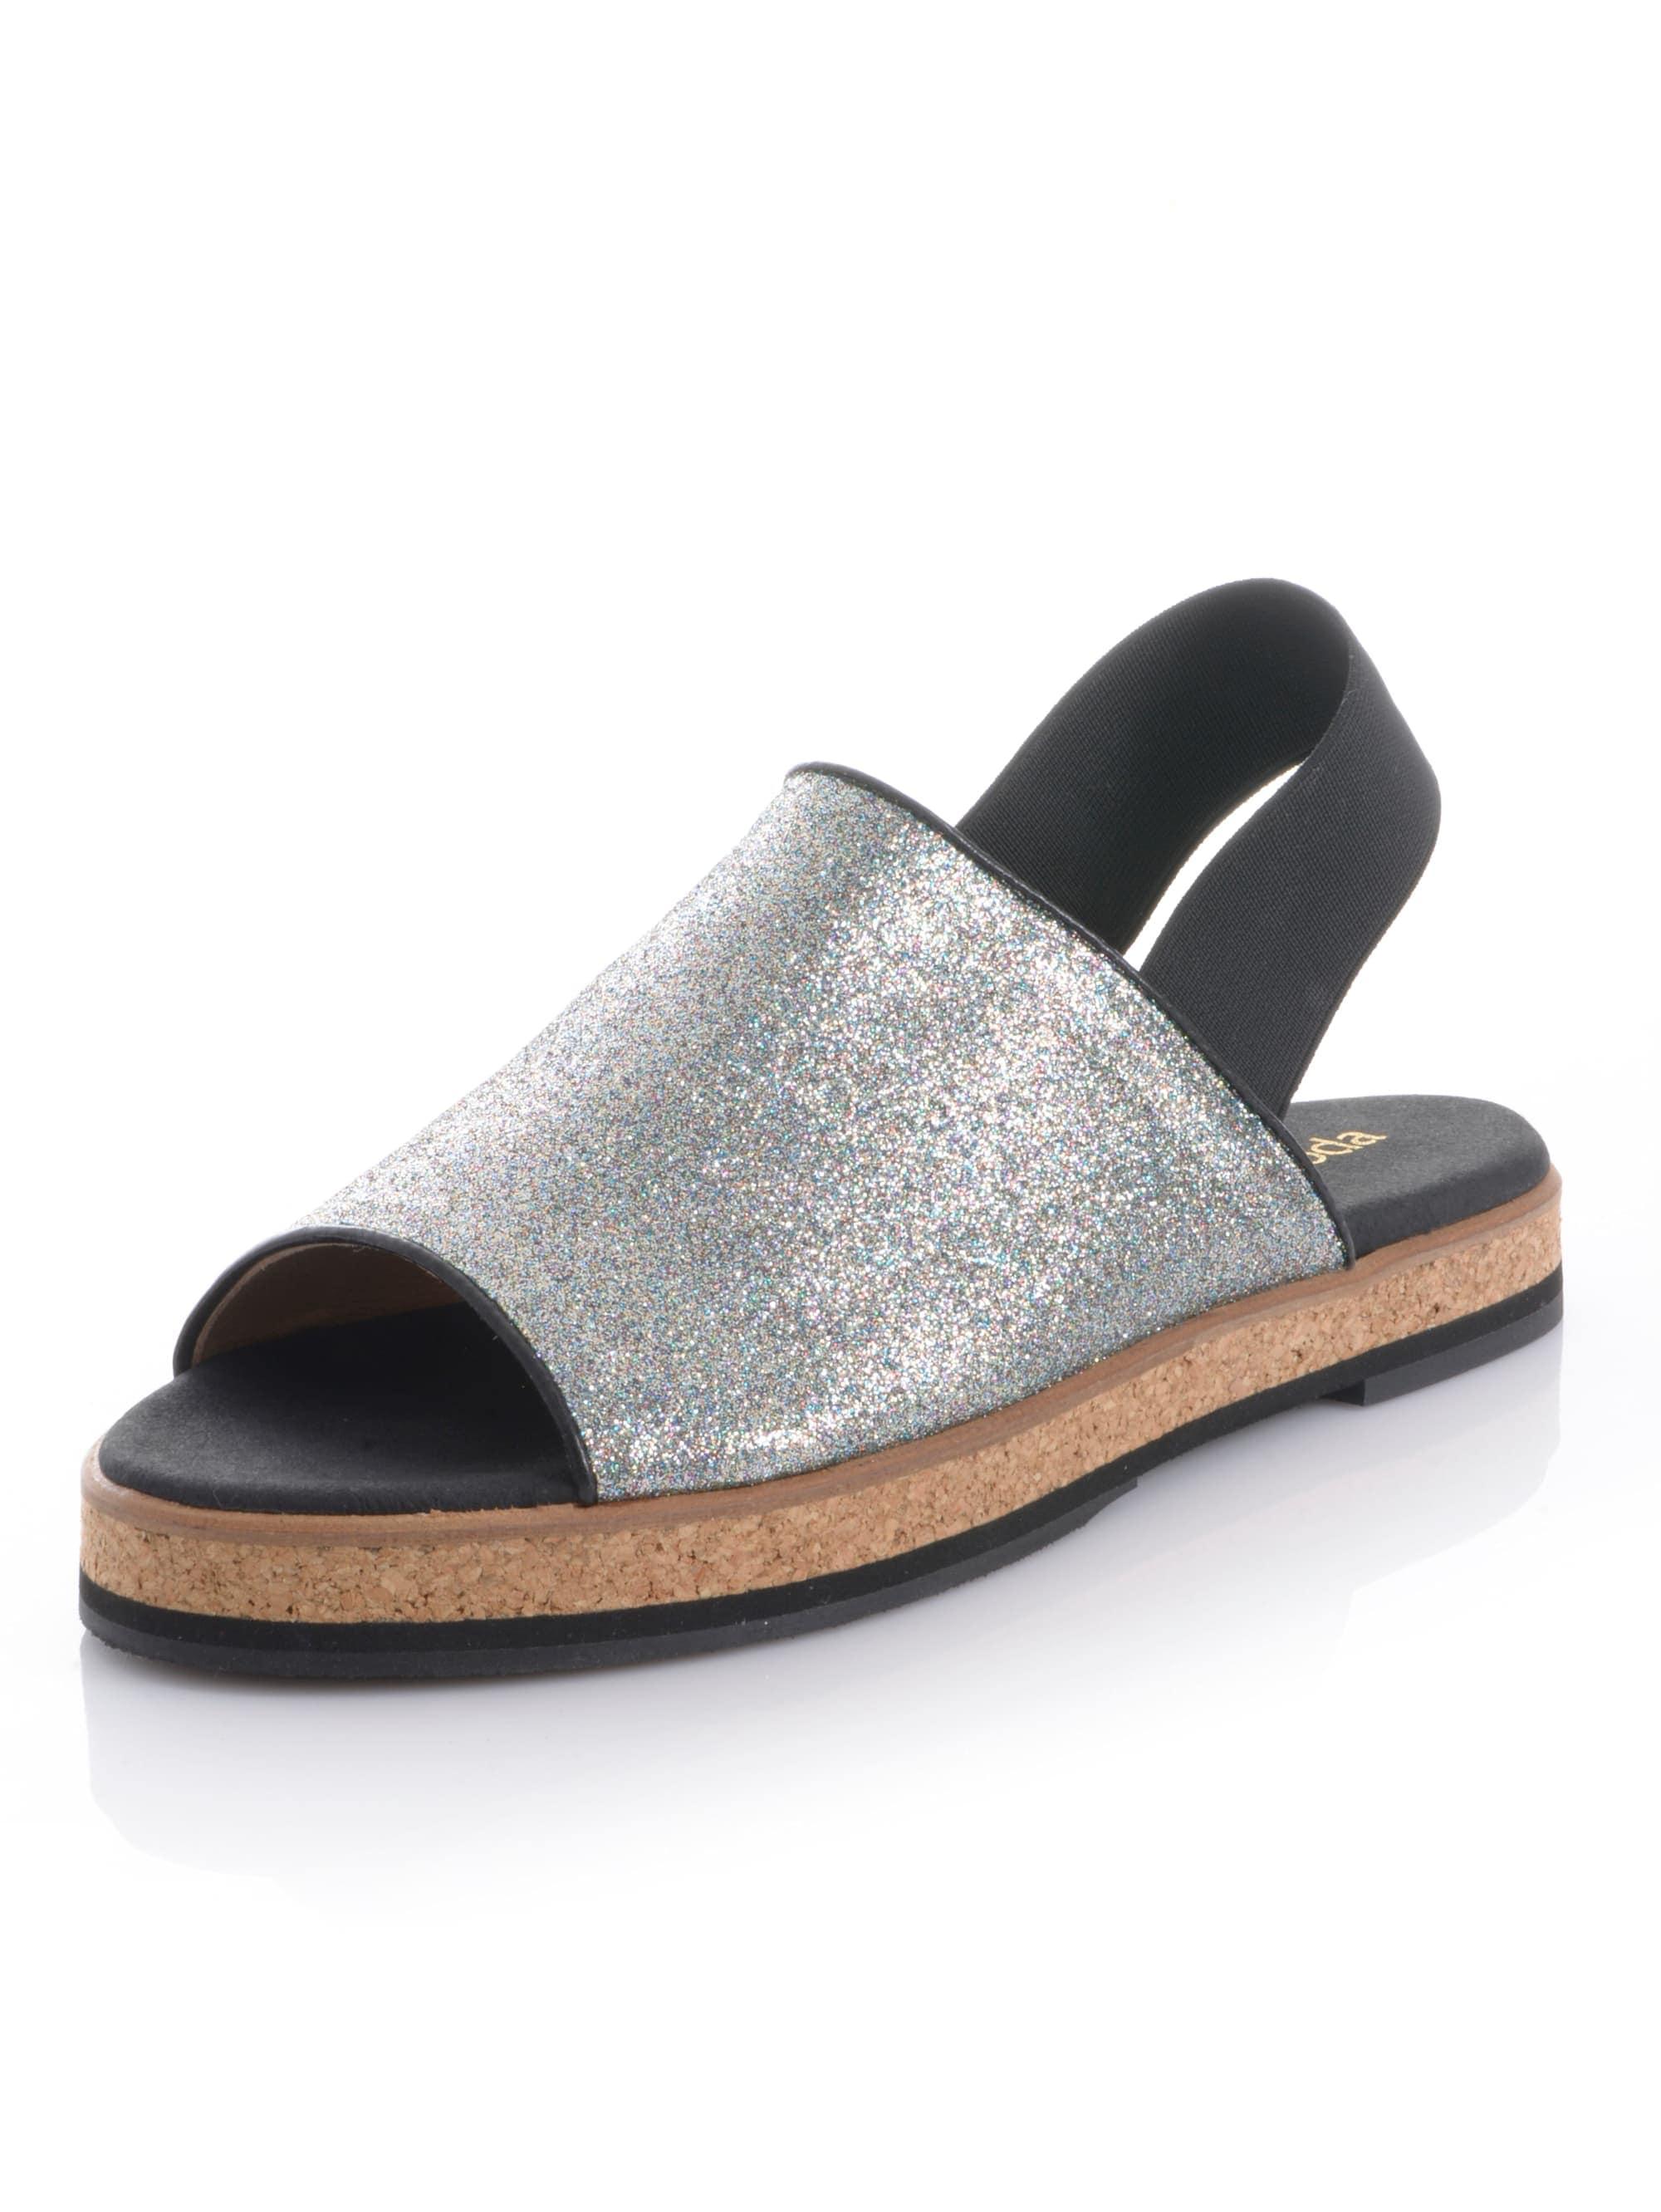 alba moda -  Sandalette, in Peeptoe-Form